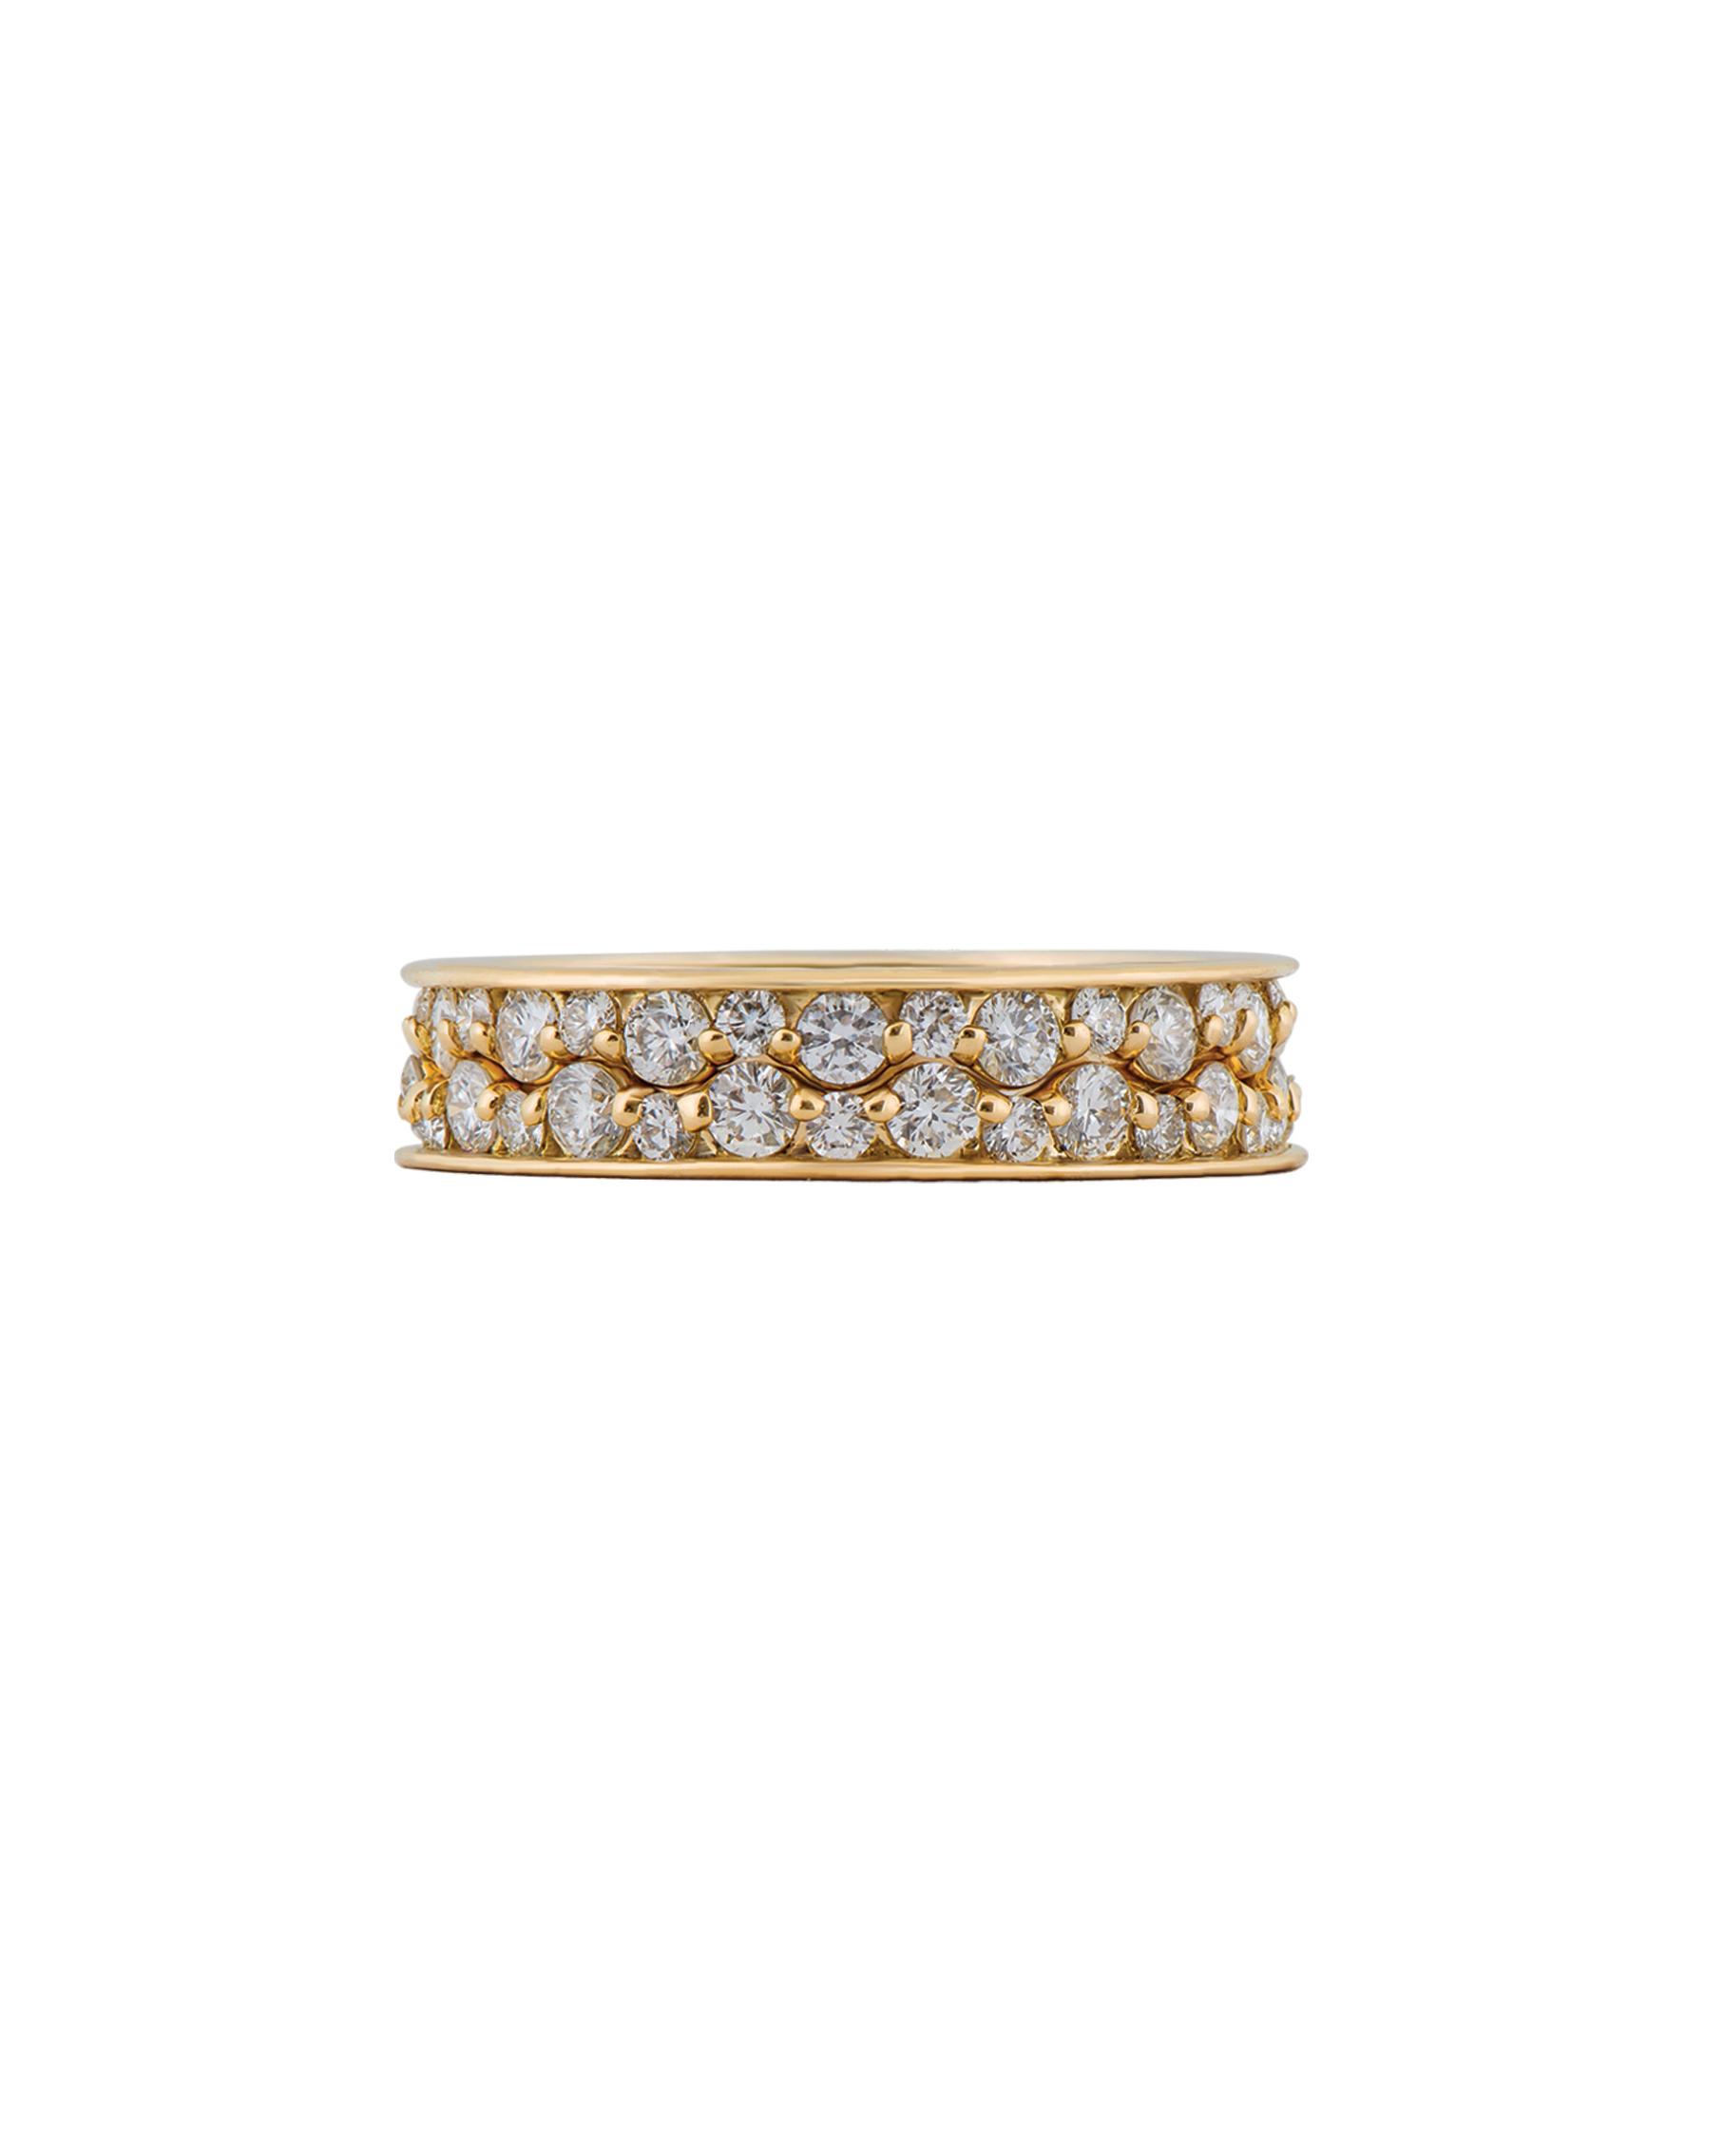 designer diamond bridal jewelry-1-3.jpg